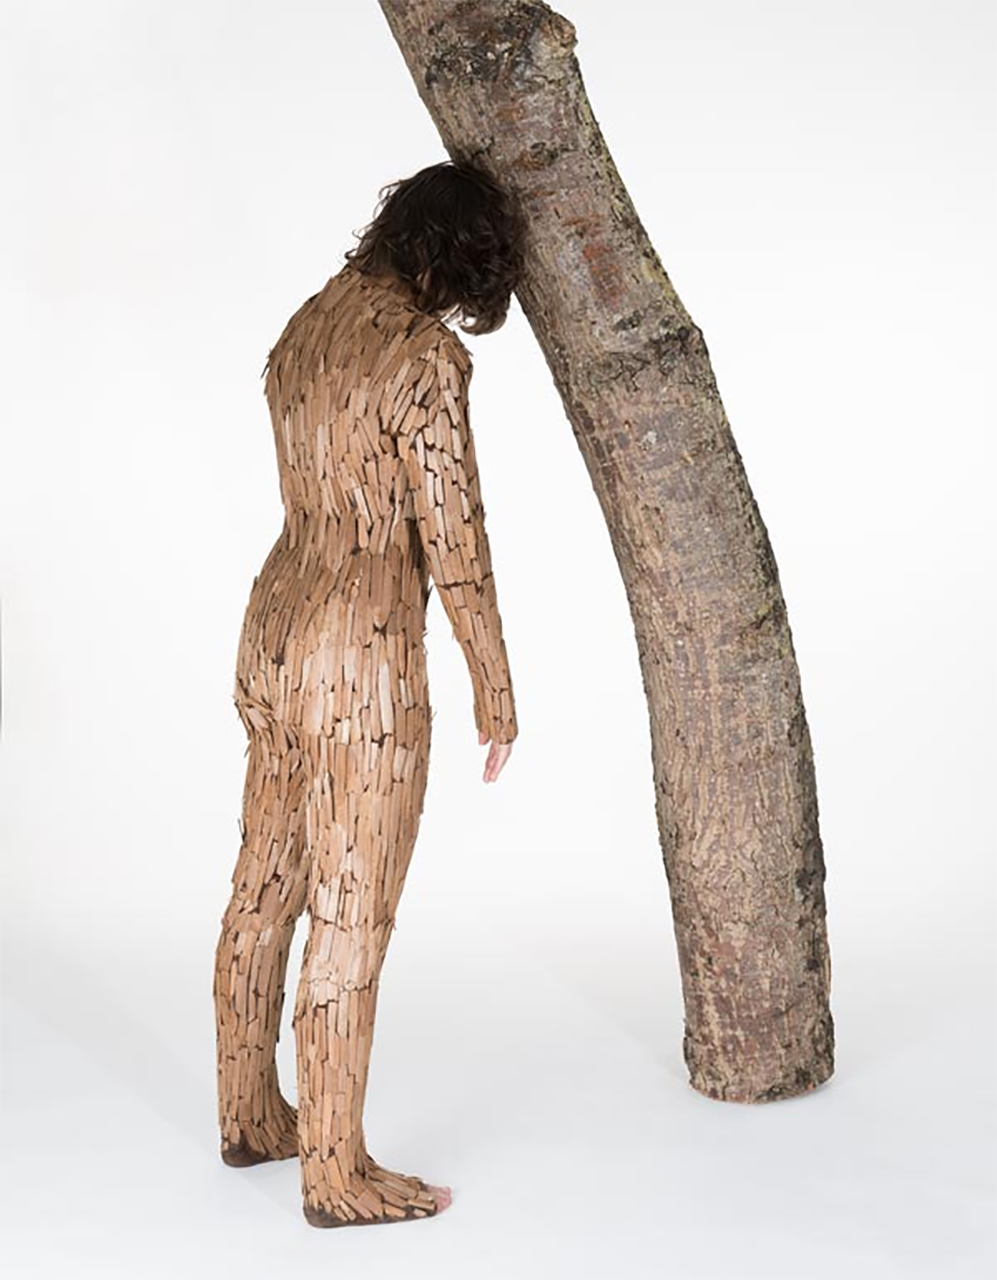 Linda_Molenaar_Tree_Pose_2011